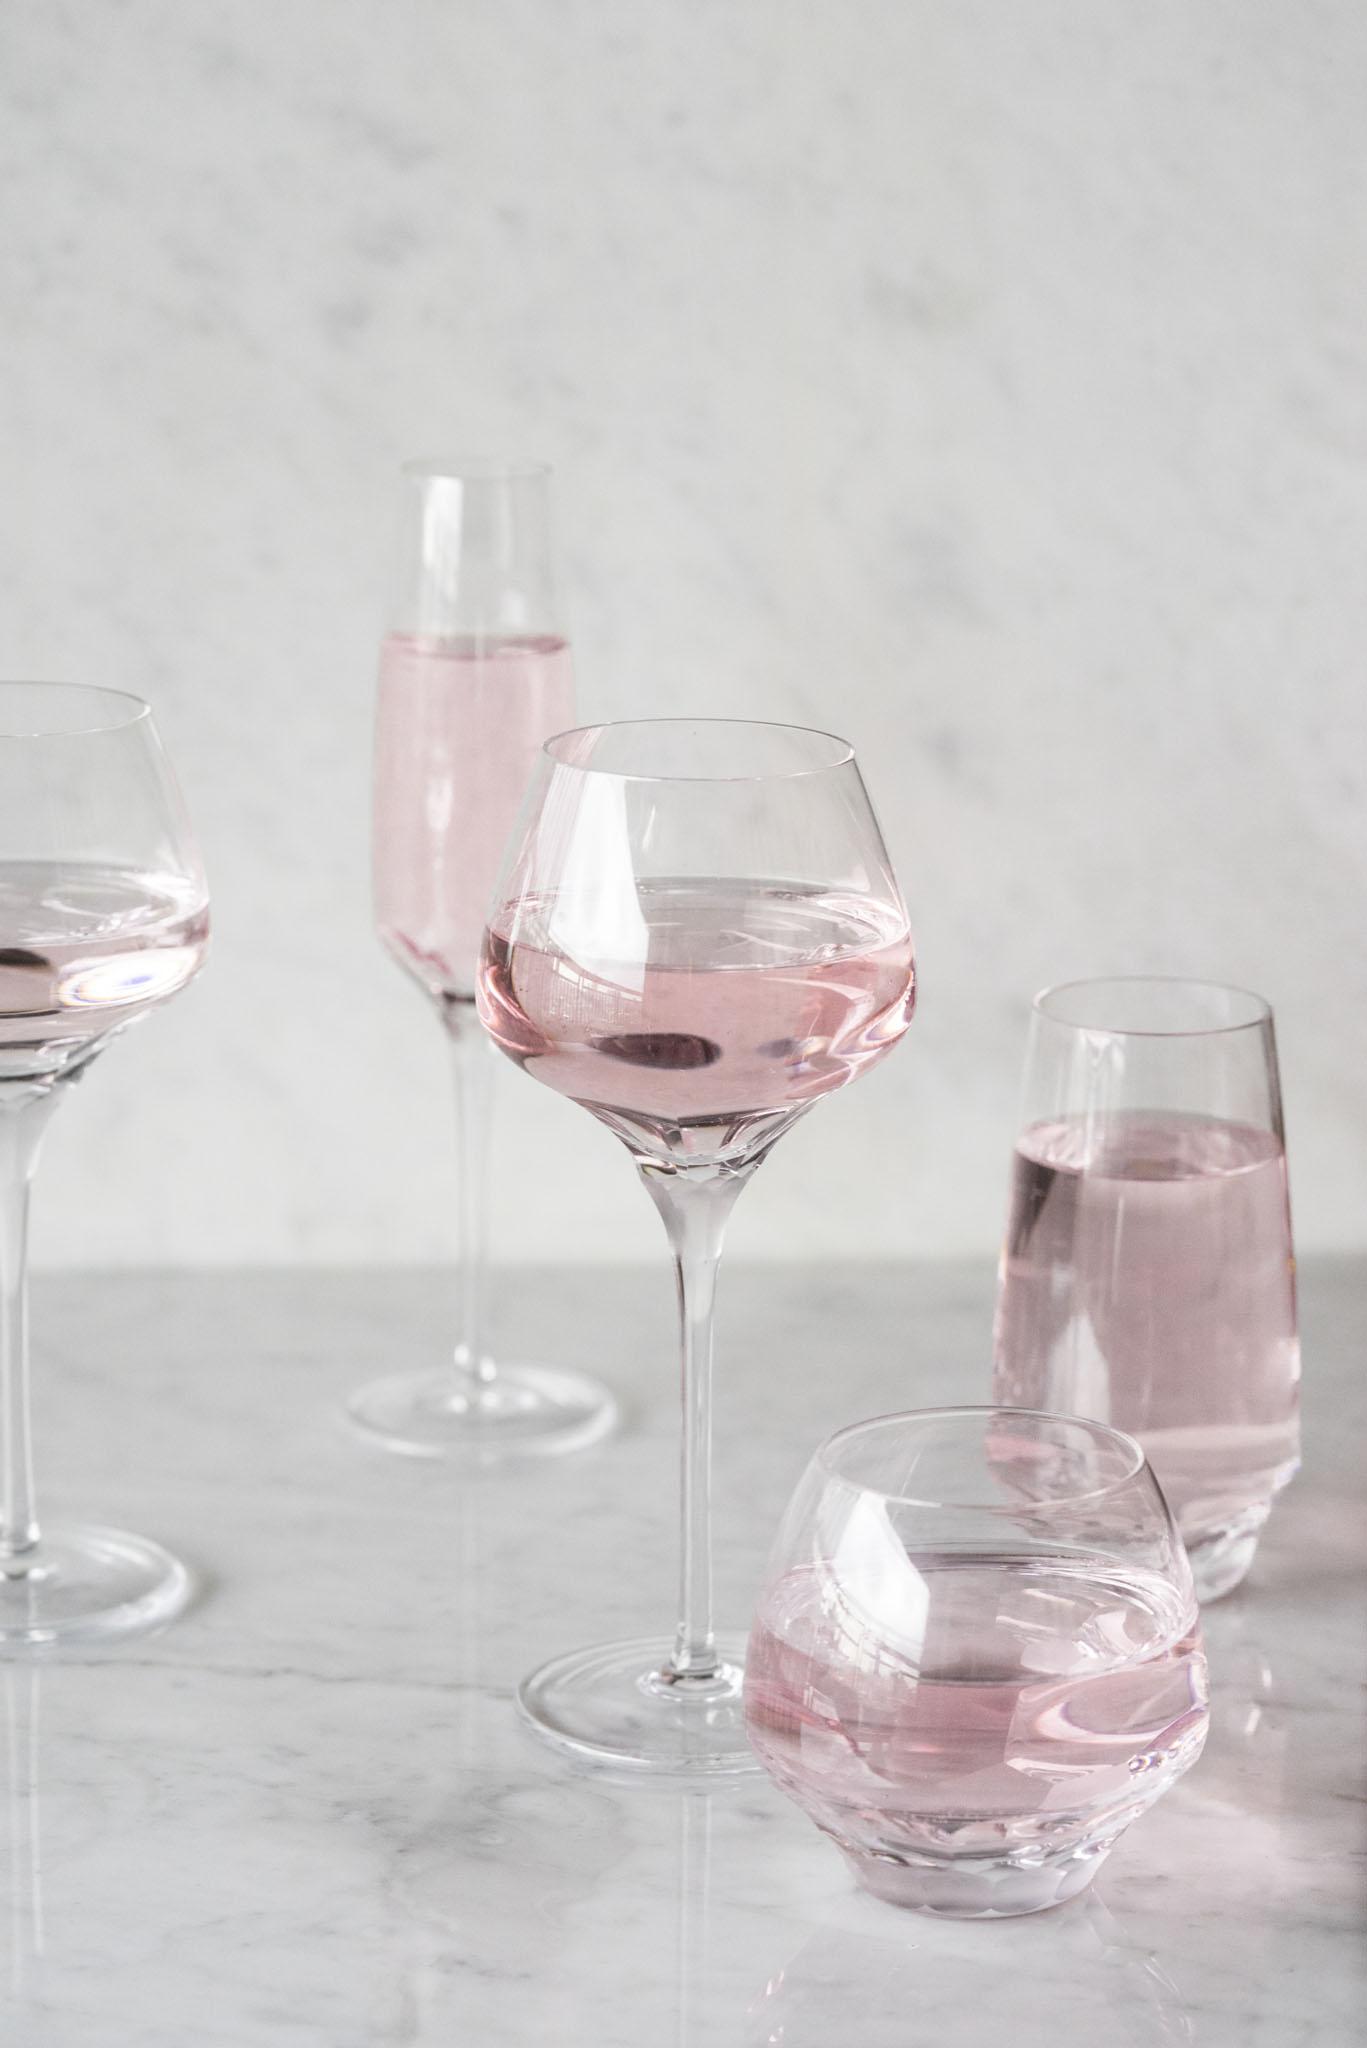 歐洲 ROGASKA 水晶玻璃 BLOSSOM 華麗綻放 白酒杯 2支裝